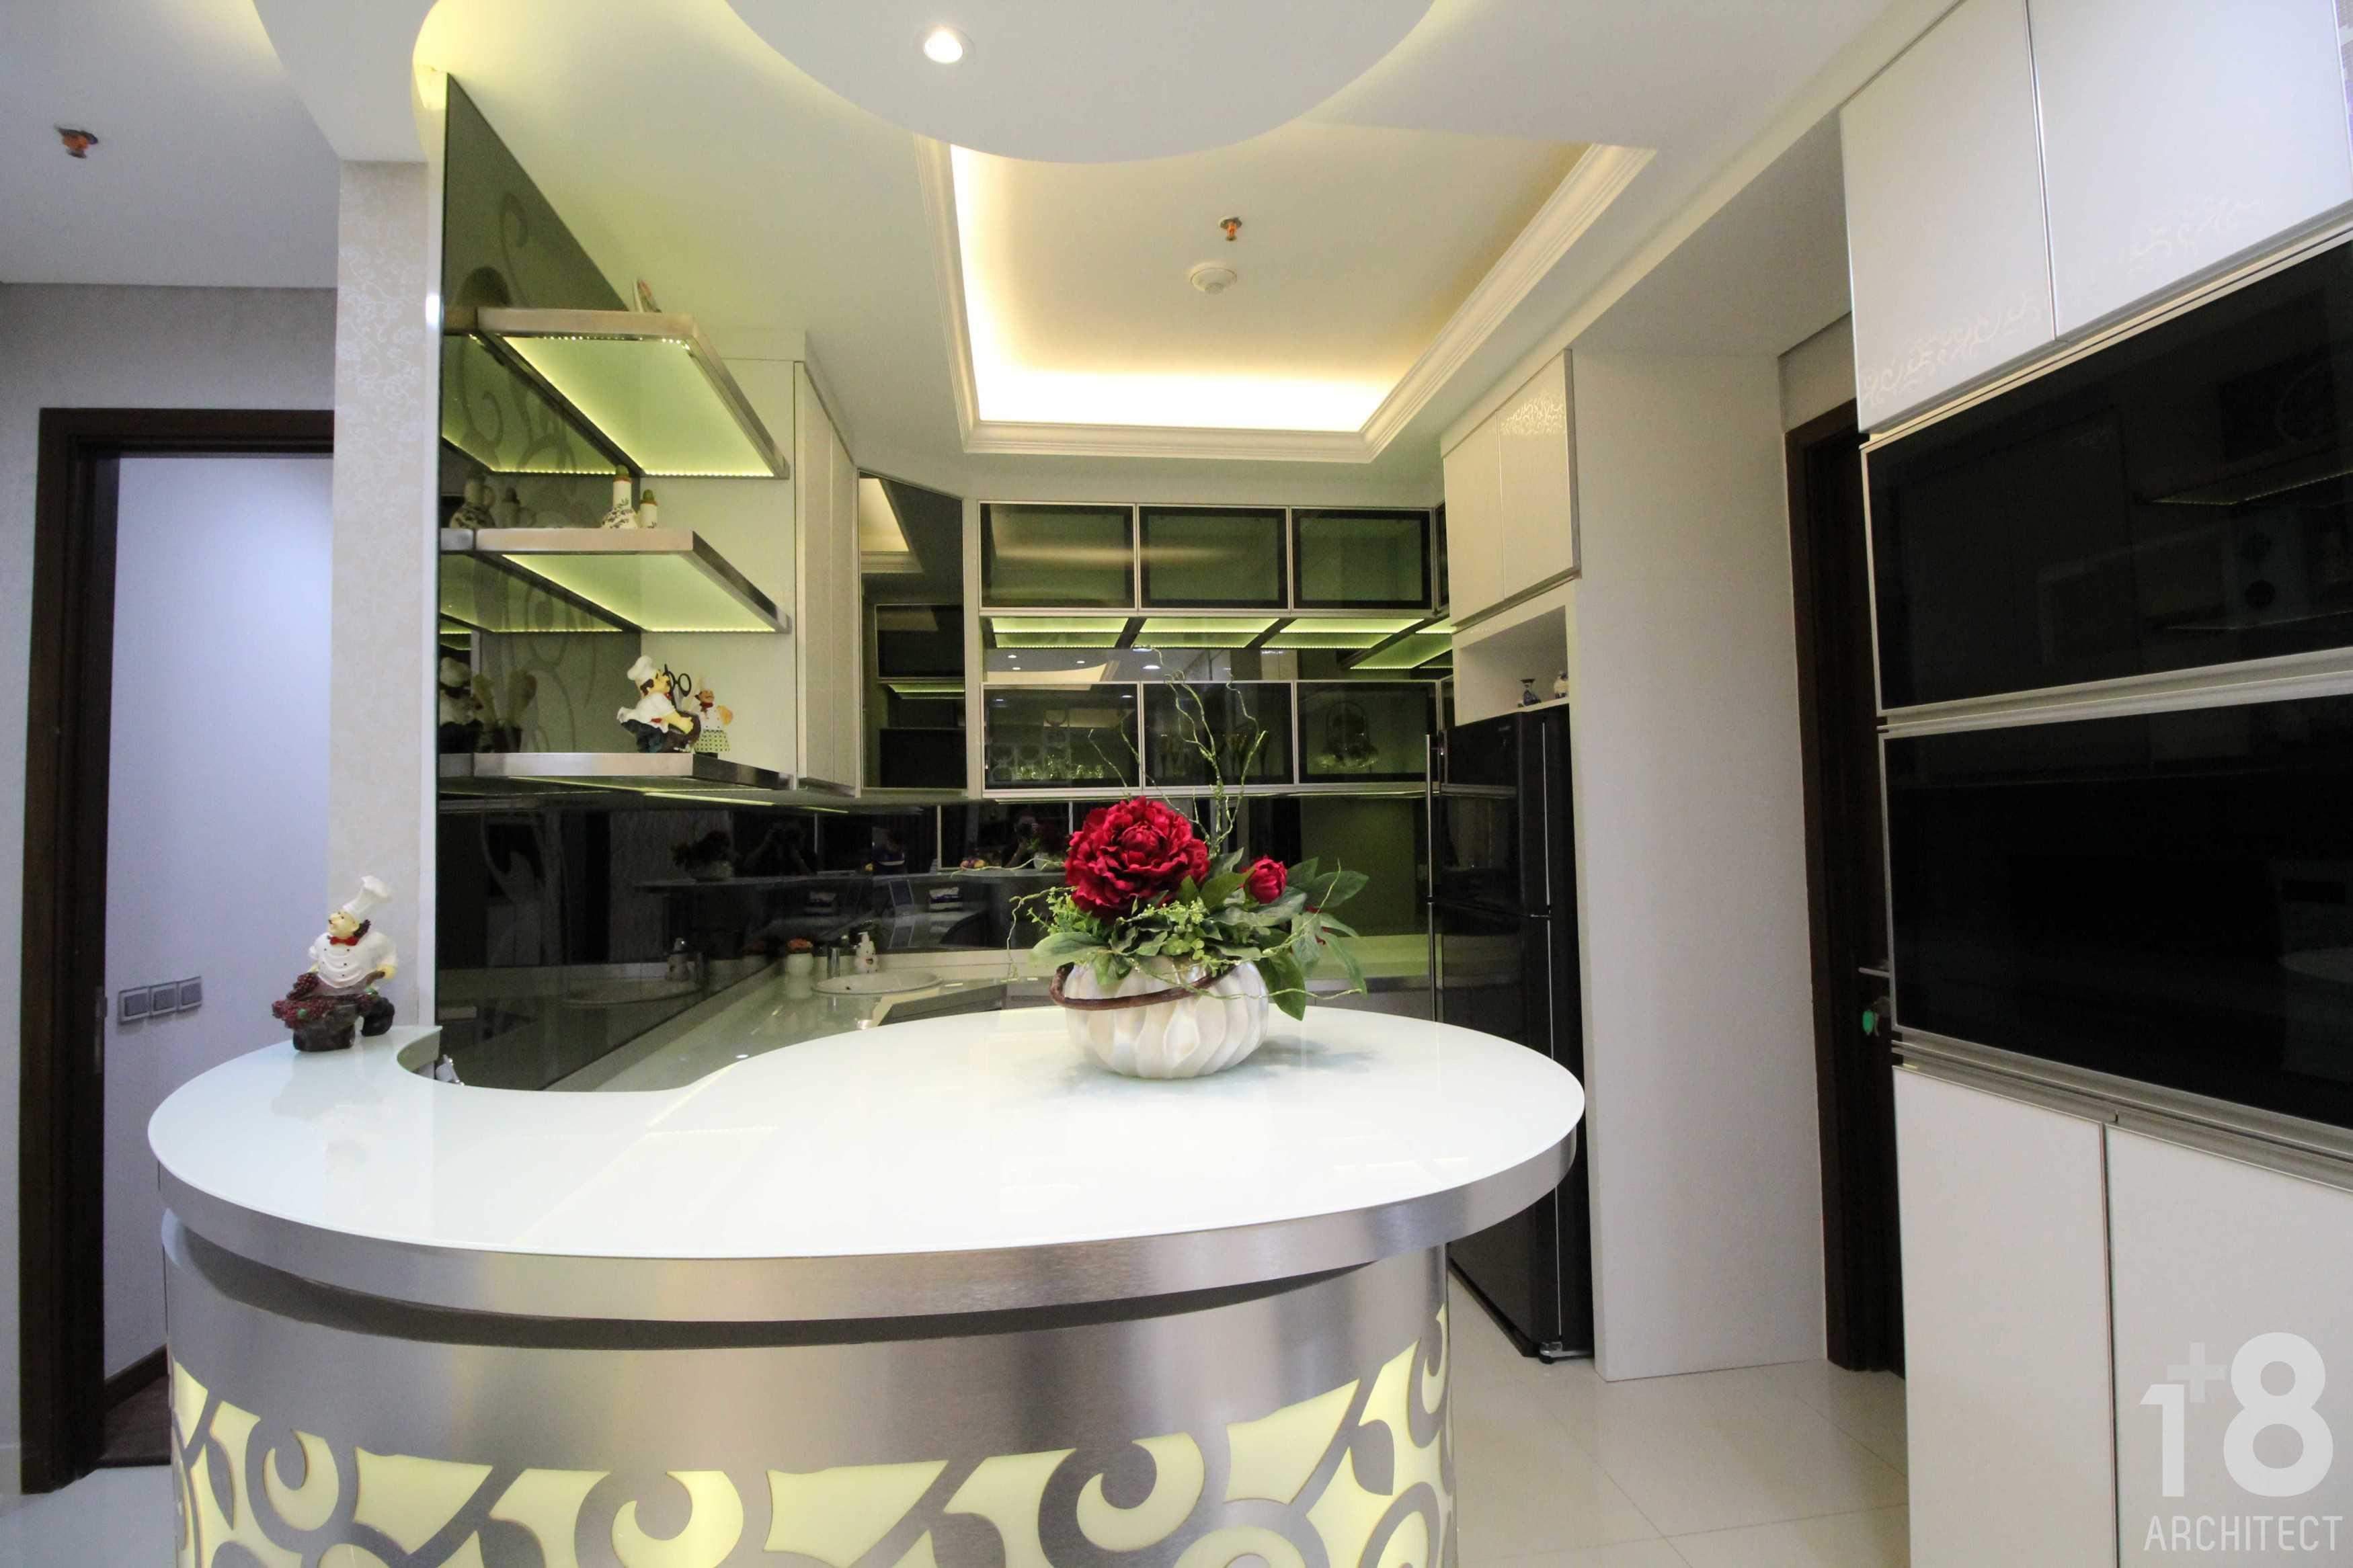 1+8 Architect St. Moritz, Presidential Tower Suite Room Jakarta, Indonesia Jakarta, Indonesia Pantry Modern  23004